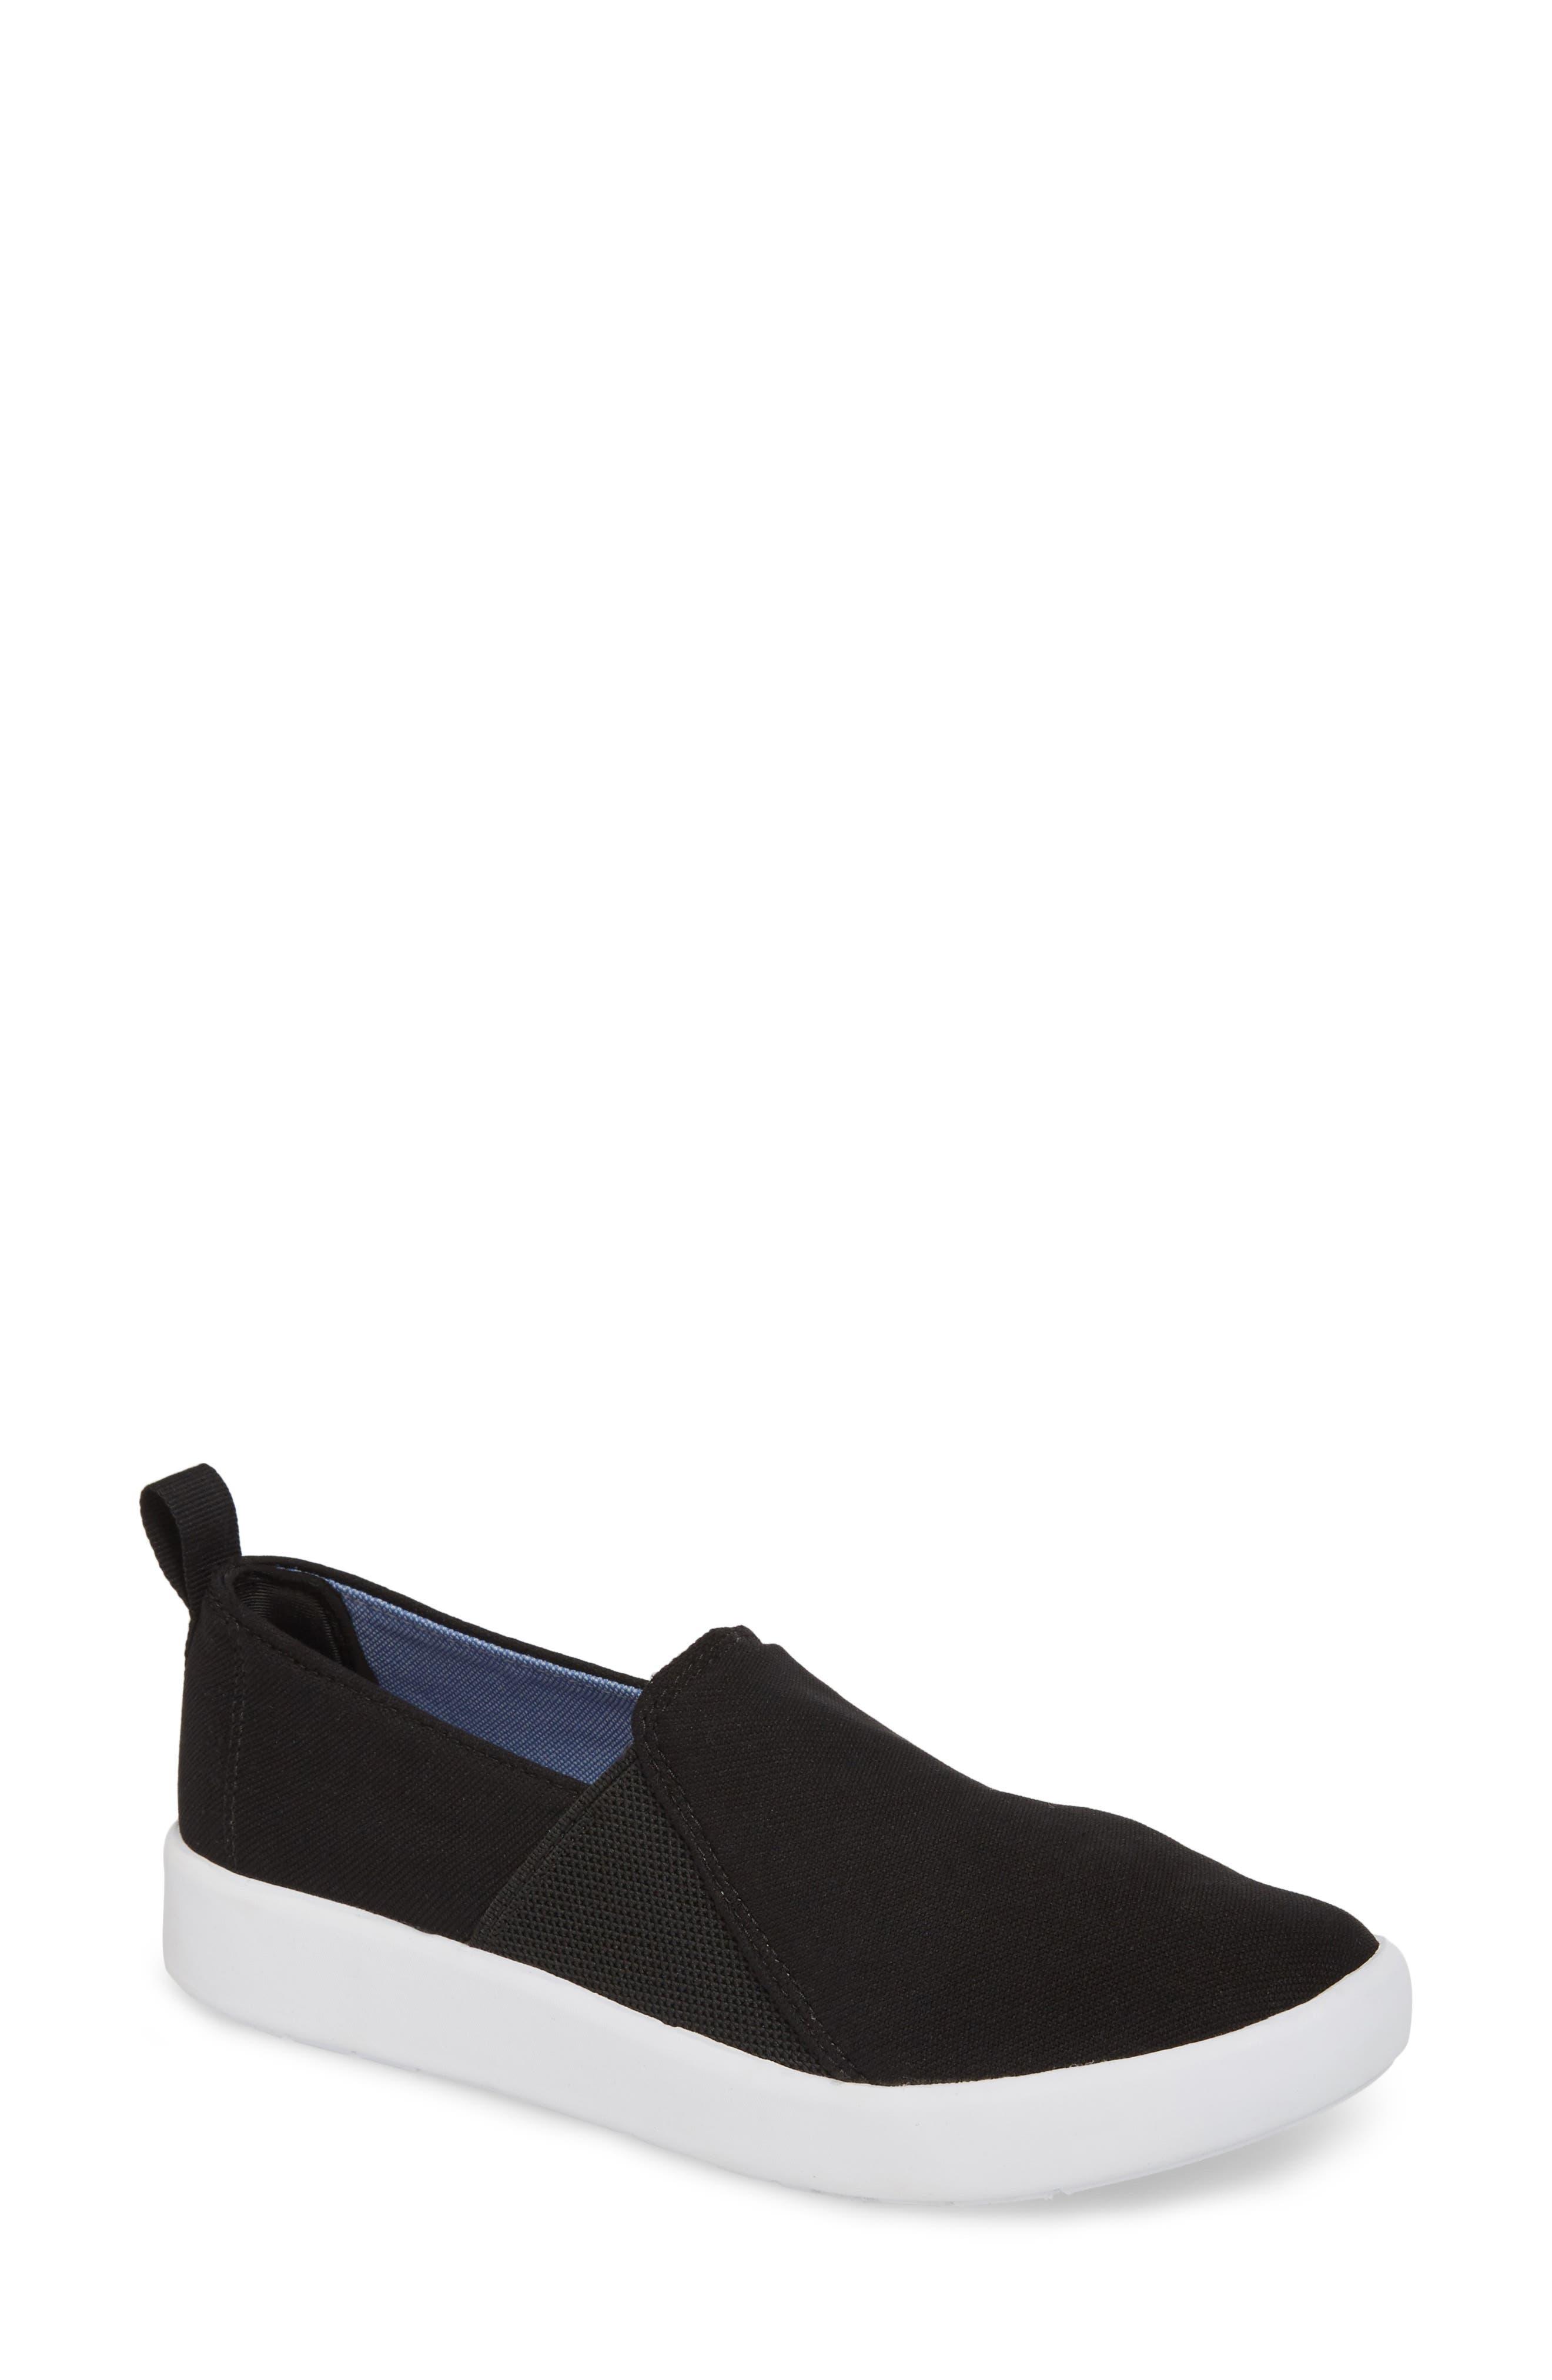 Studio Liv Jersey Slip-On Sneaker,                             Main thumbnail 1, color,                             Black